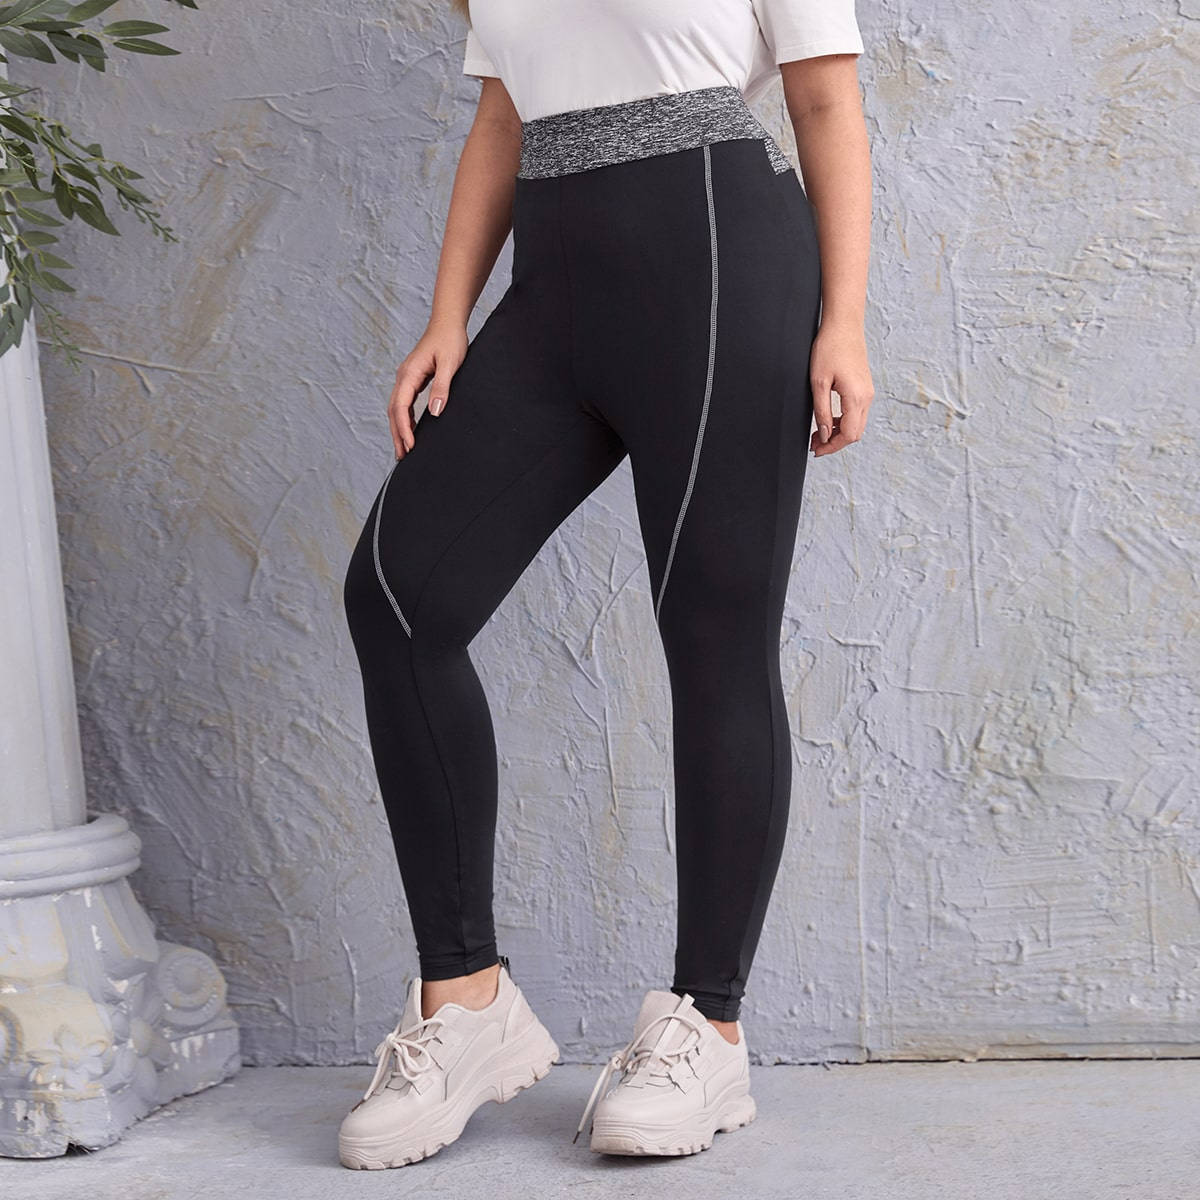 SHEIN Sport Vlak Grote maat: legging